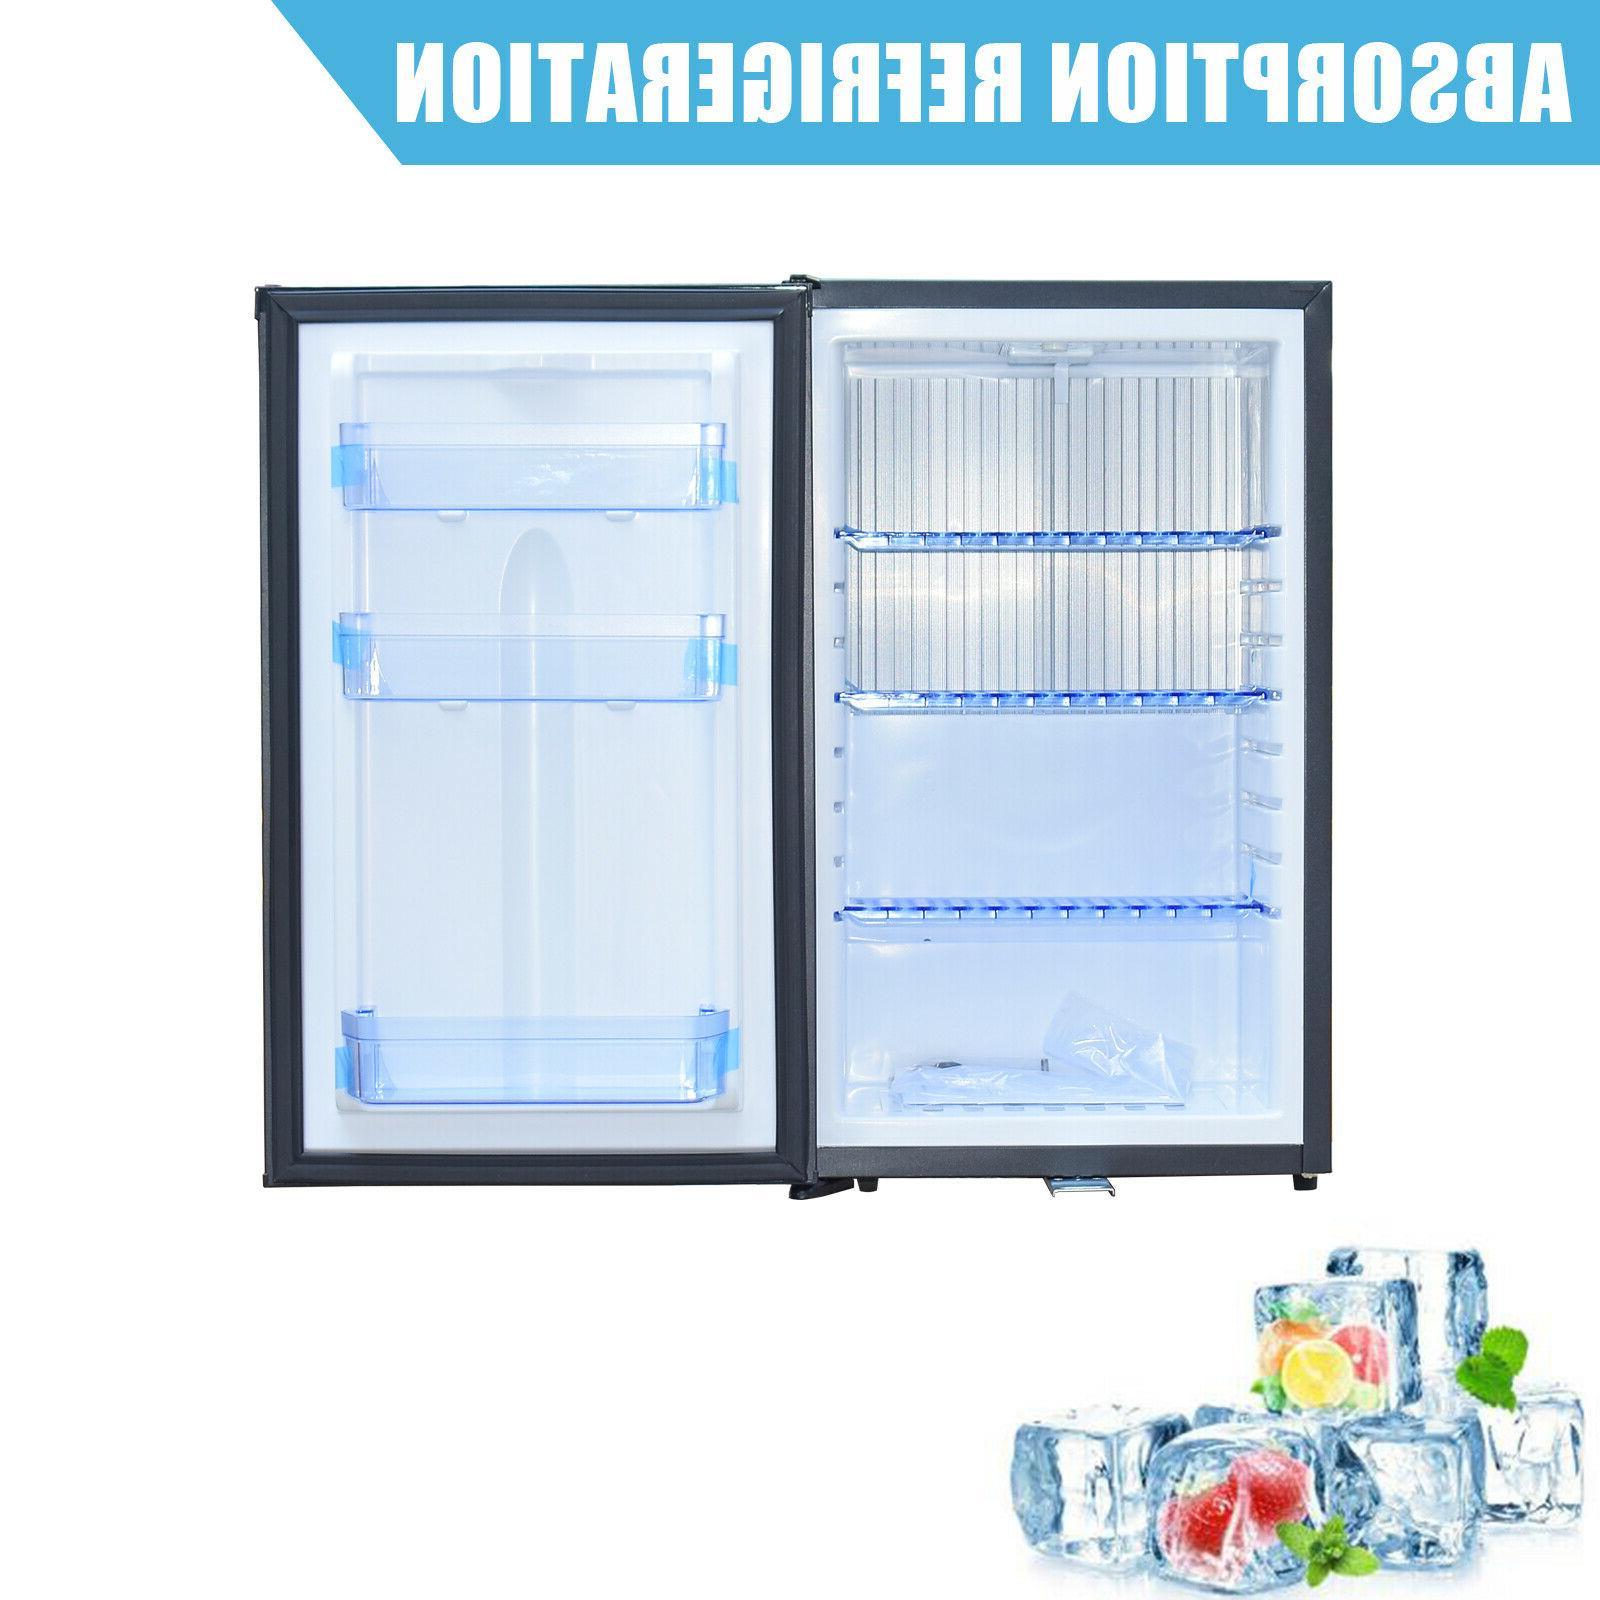 Mini RV Refrigerator 12V Semi Truck Fridge AC DC Compact Sil